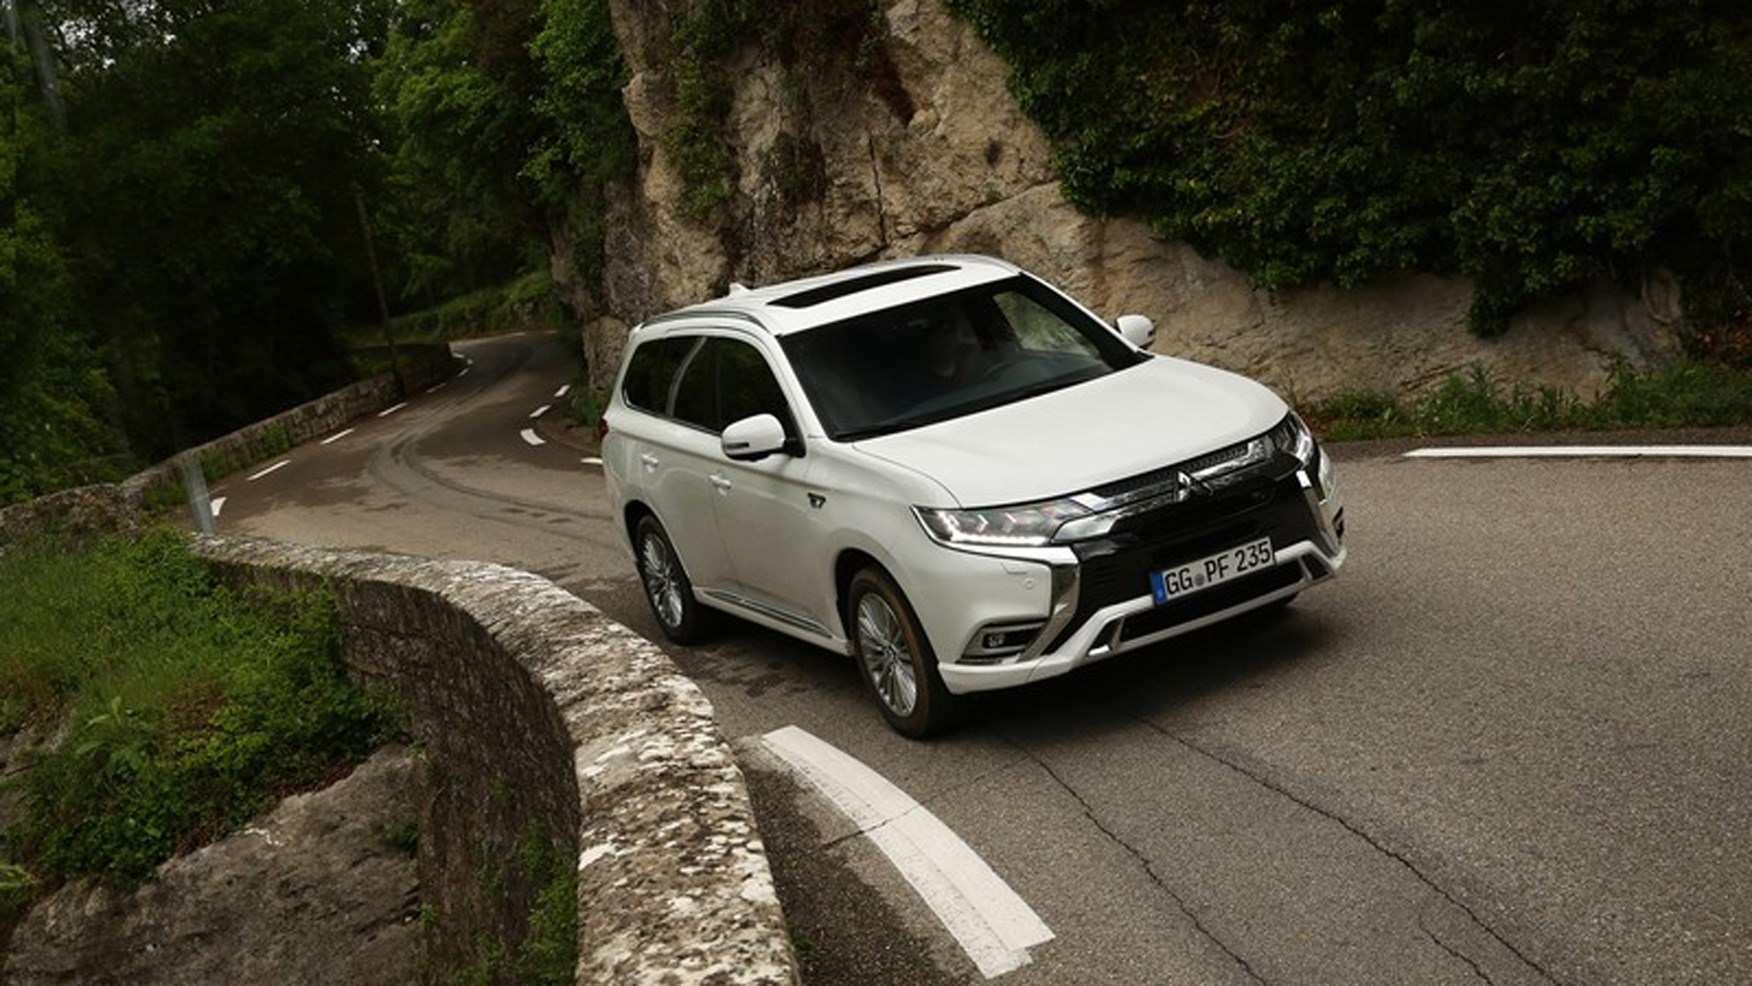 91 Great 2019 Mitsubishi Outlander Phev Review Price for 2019 Mitsubishi Outlander Phev Review